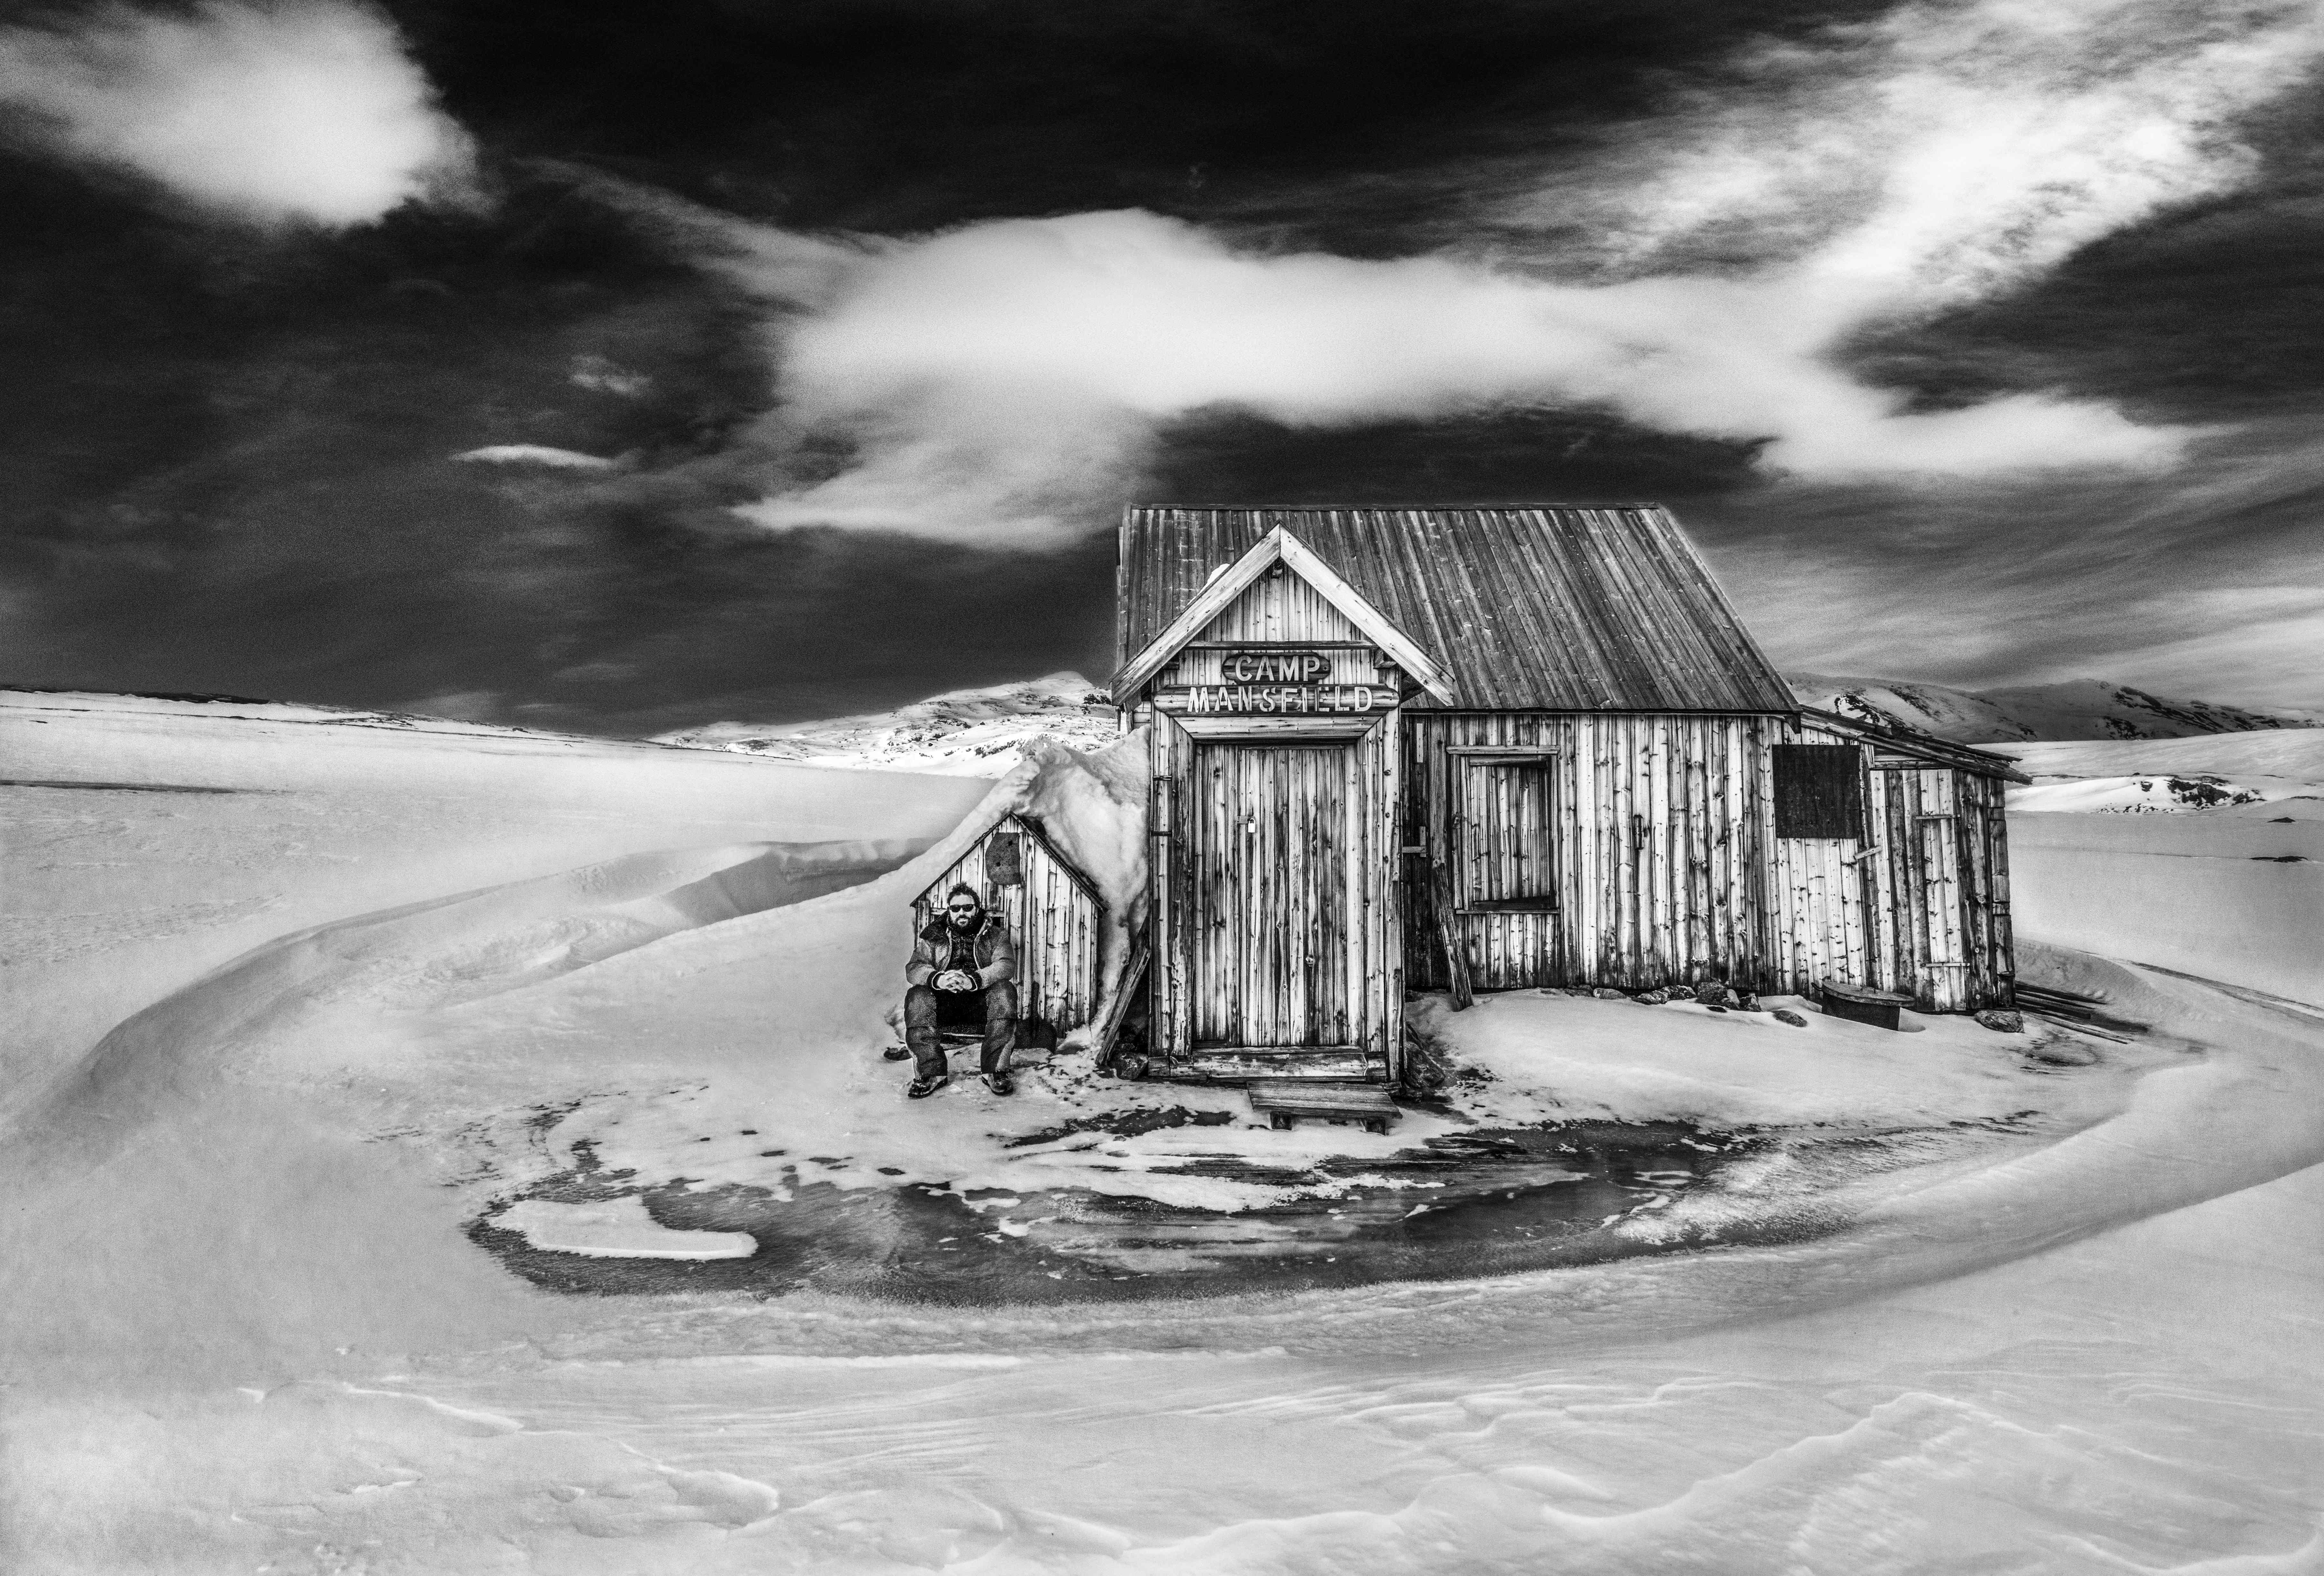 MANSFIELD CAMP, Svalbard